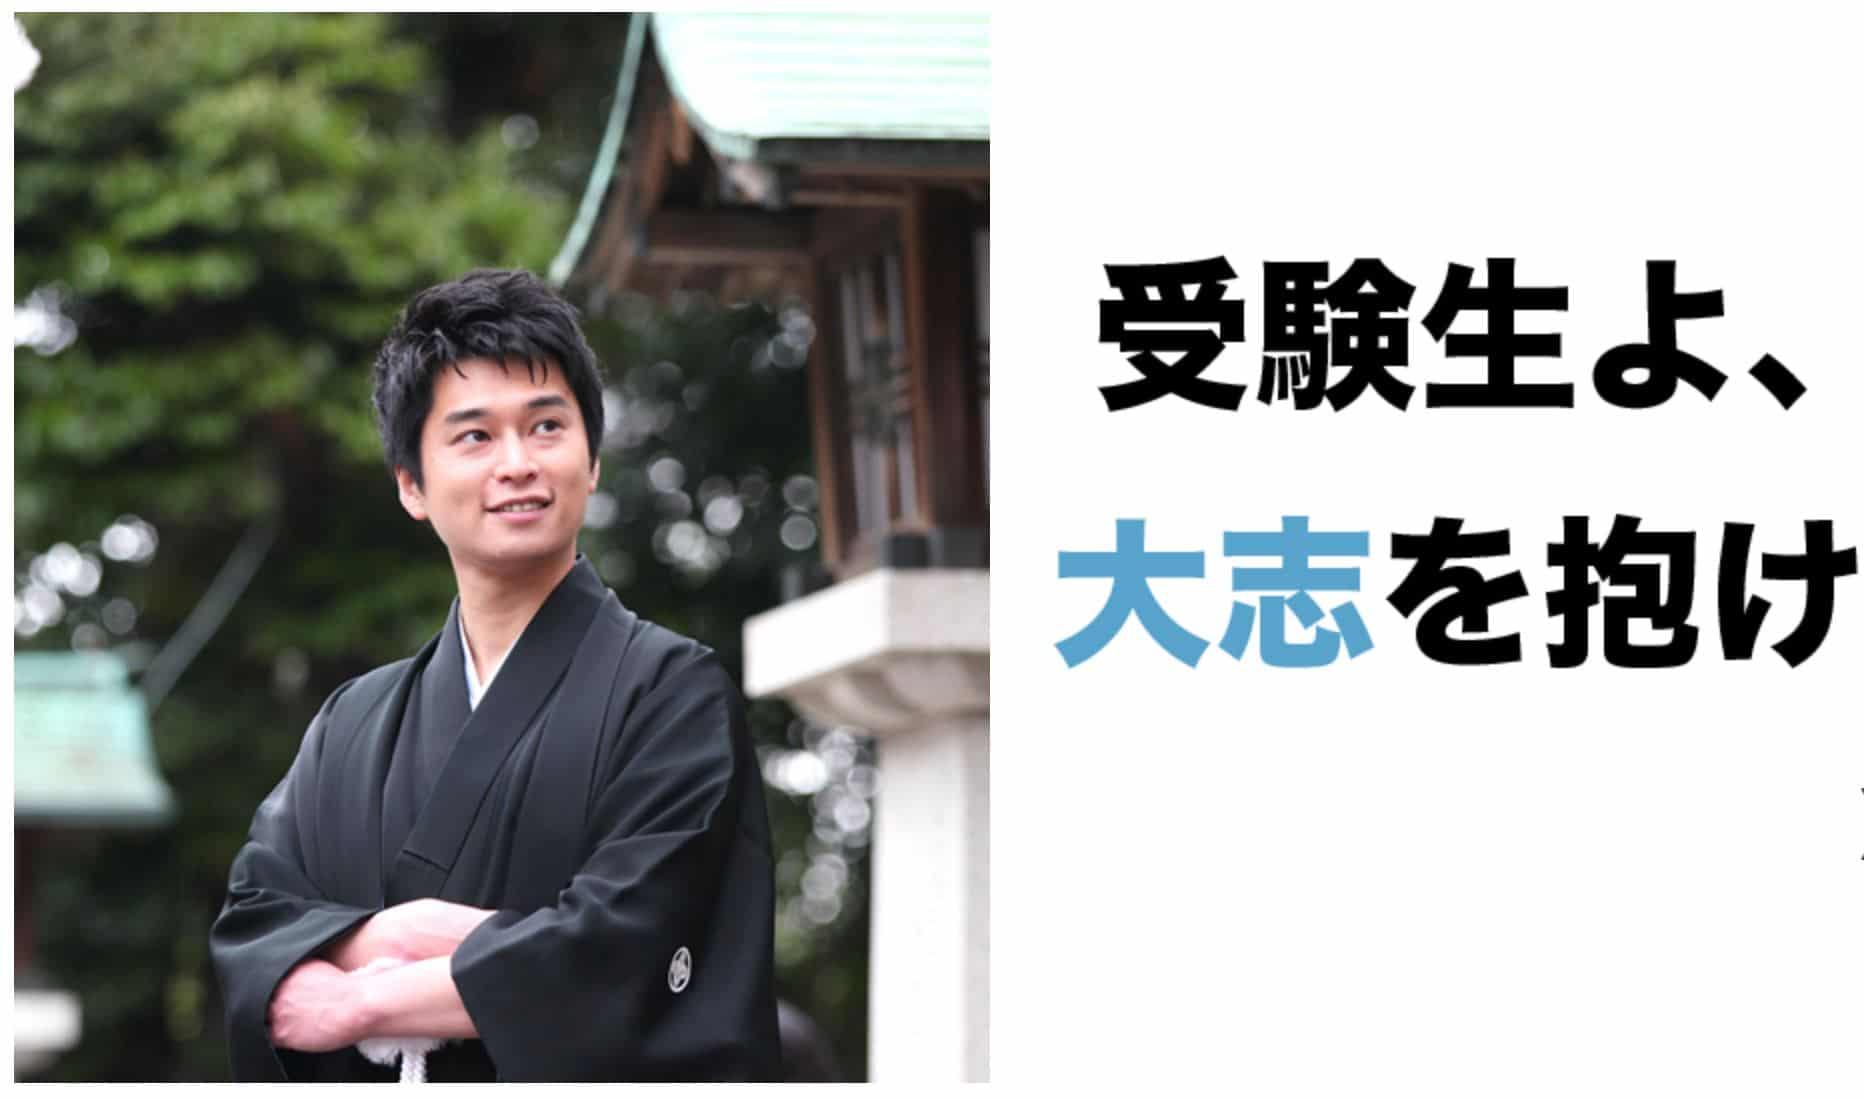 AO・推薦入試専門塾【KOSSUN教育ラボ】の評判、口コミ、料金について